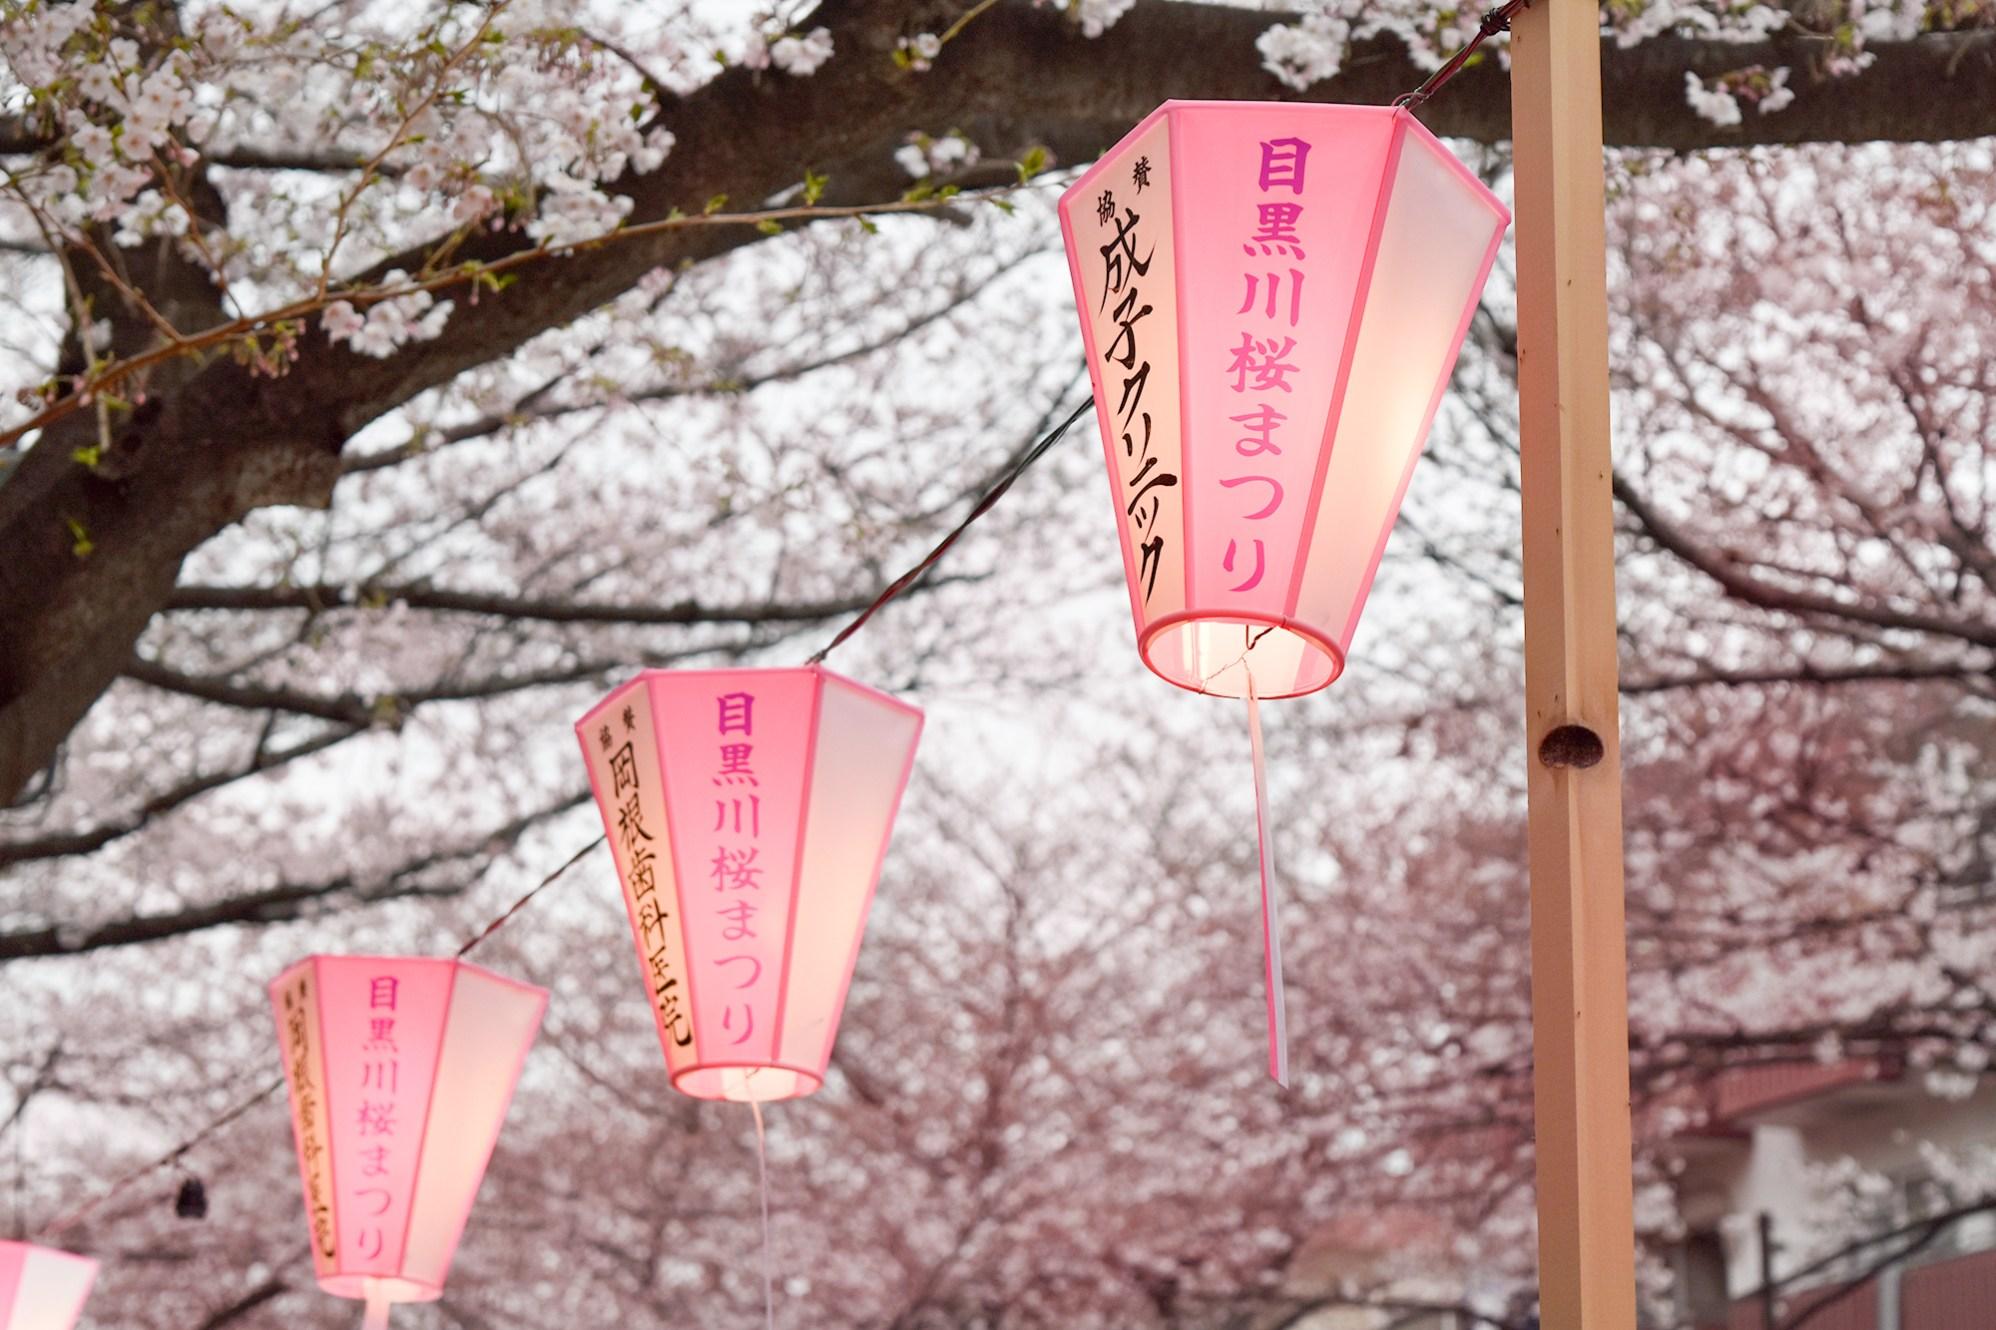 Lanterns along Meguro River